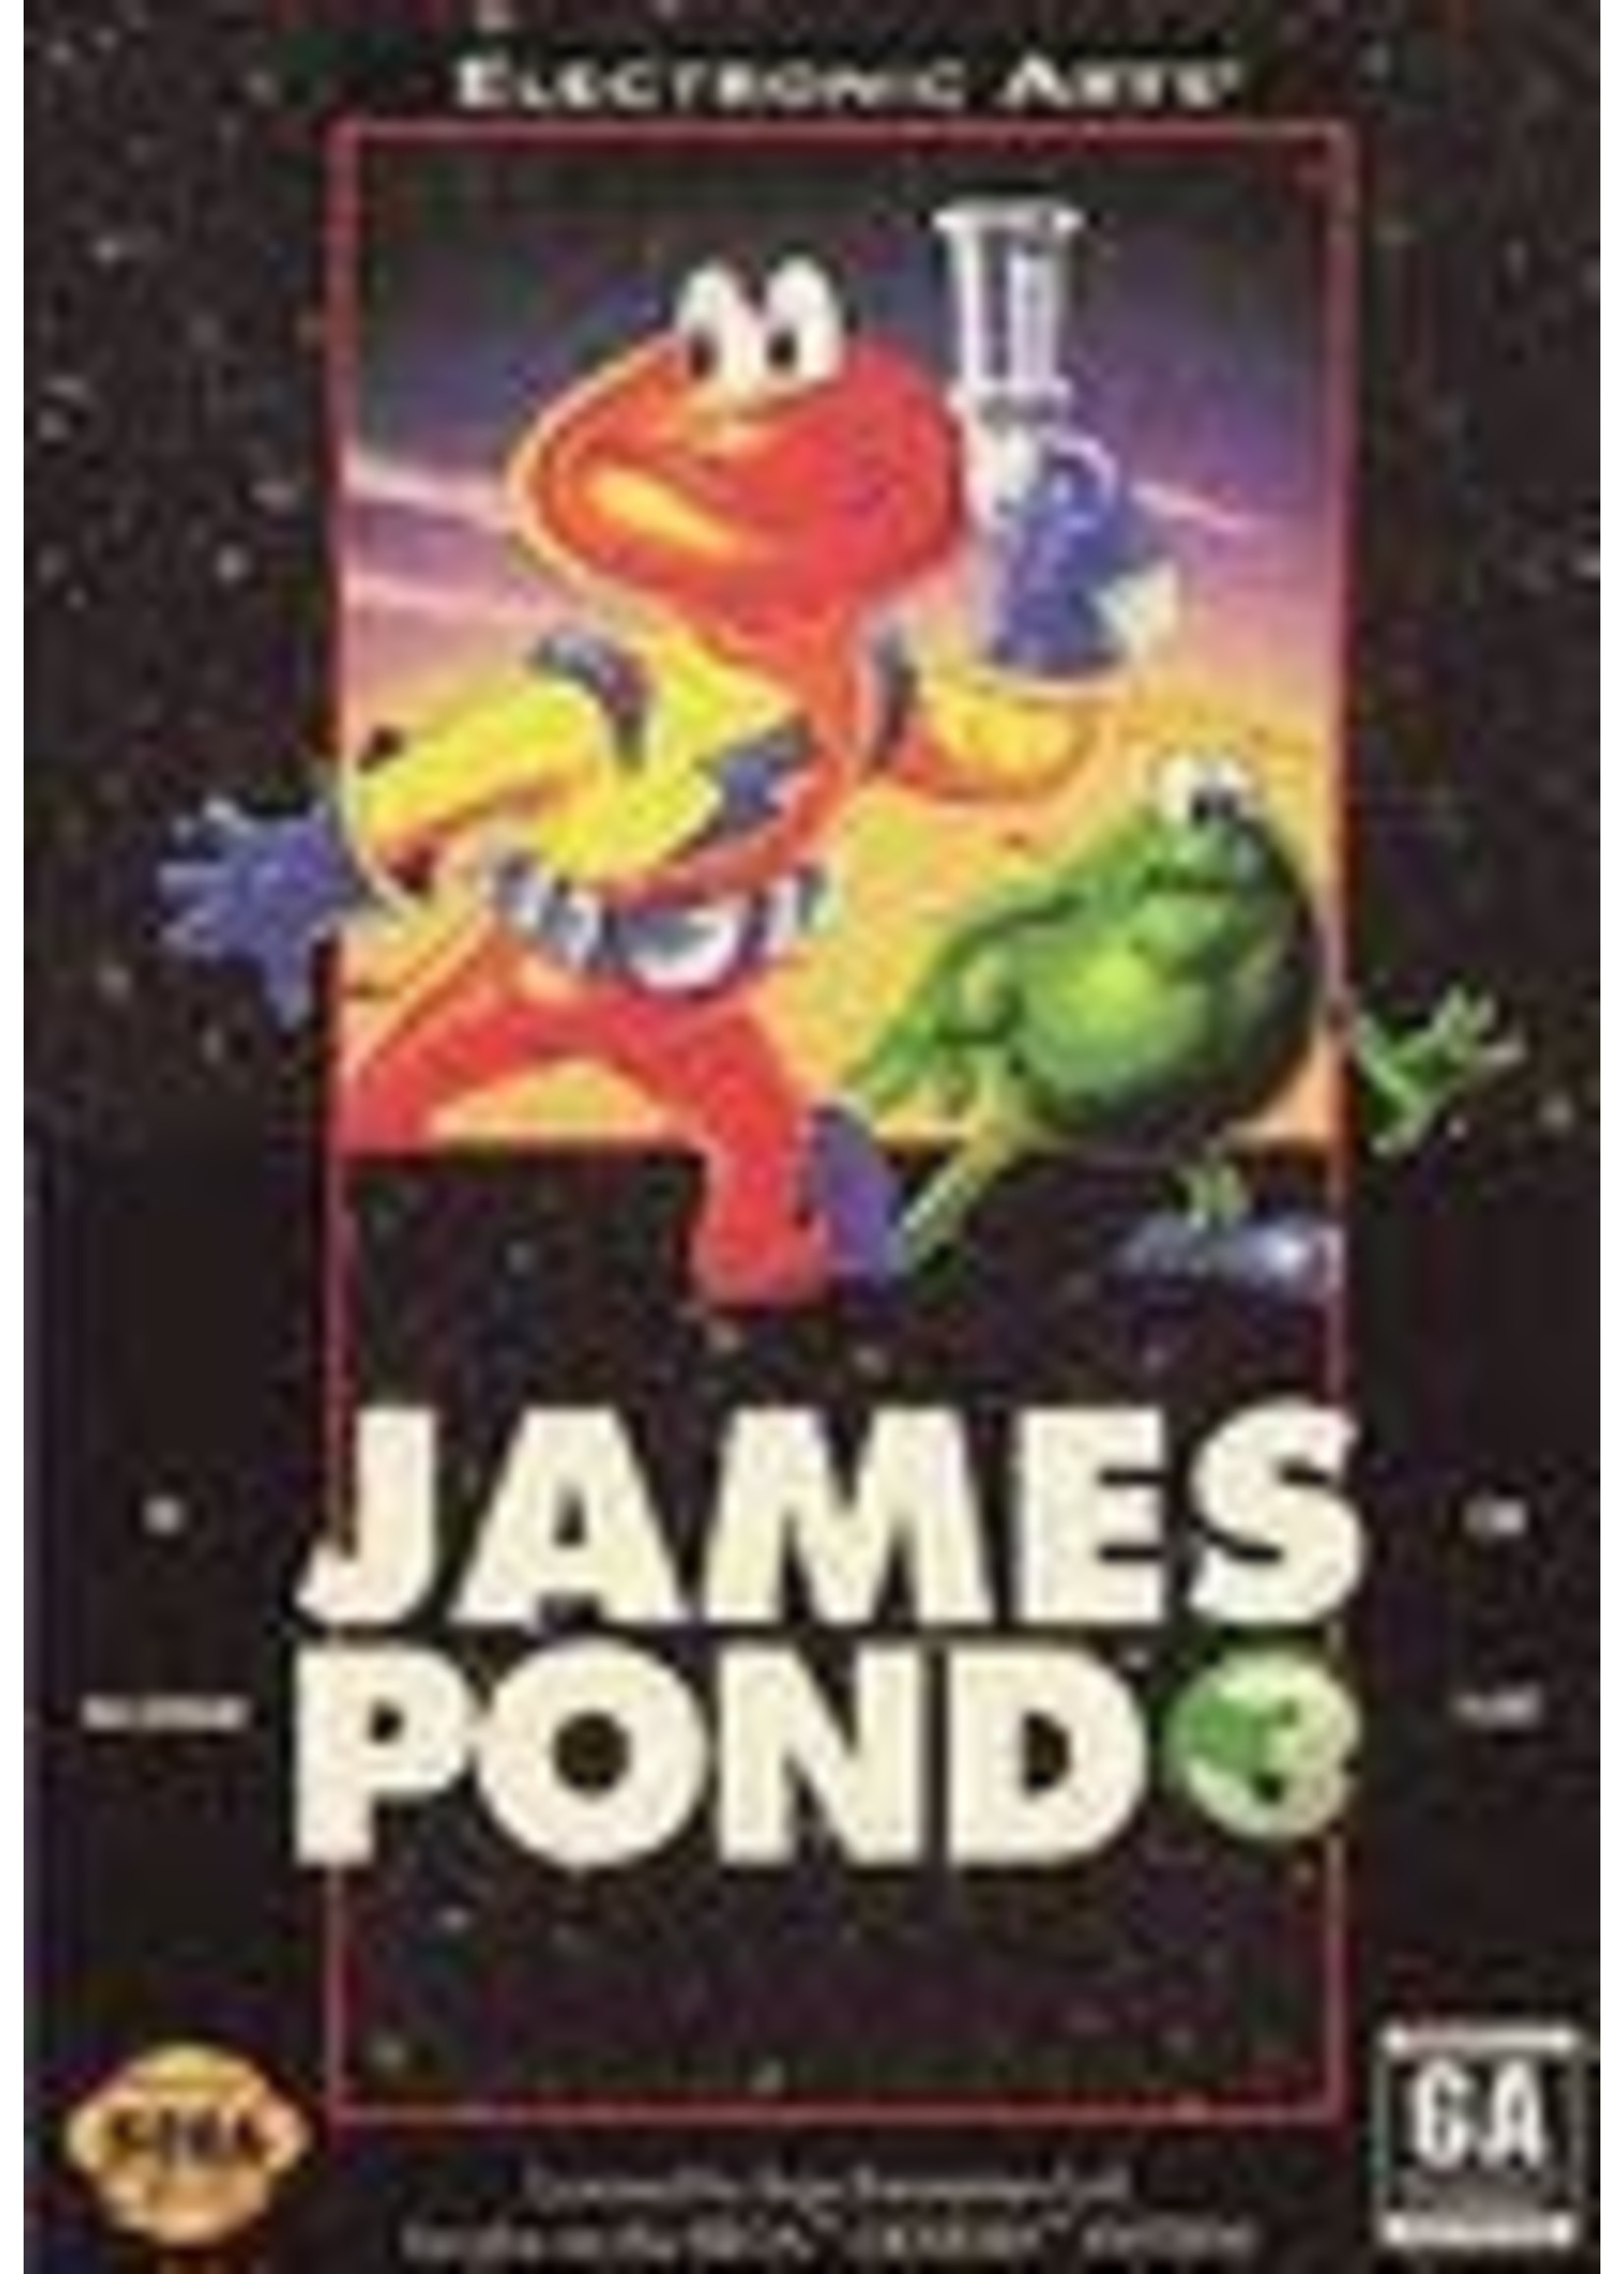 James Pond 3 Operation Starfish Sega Genesis